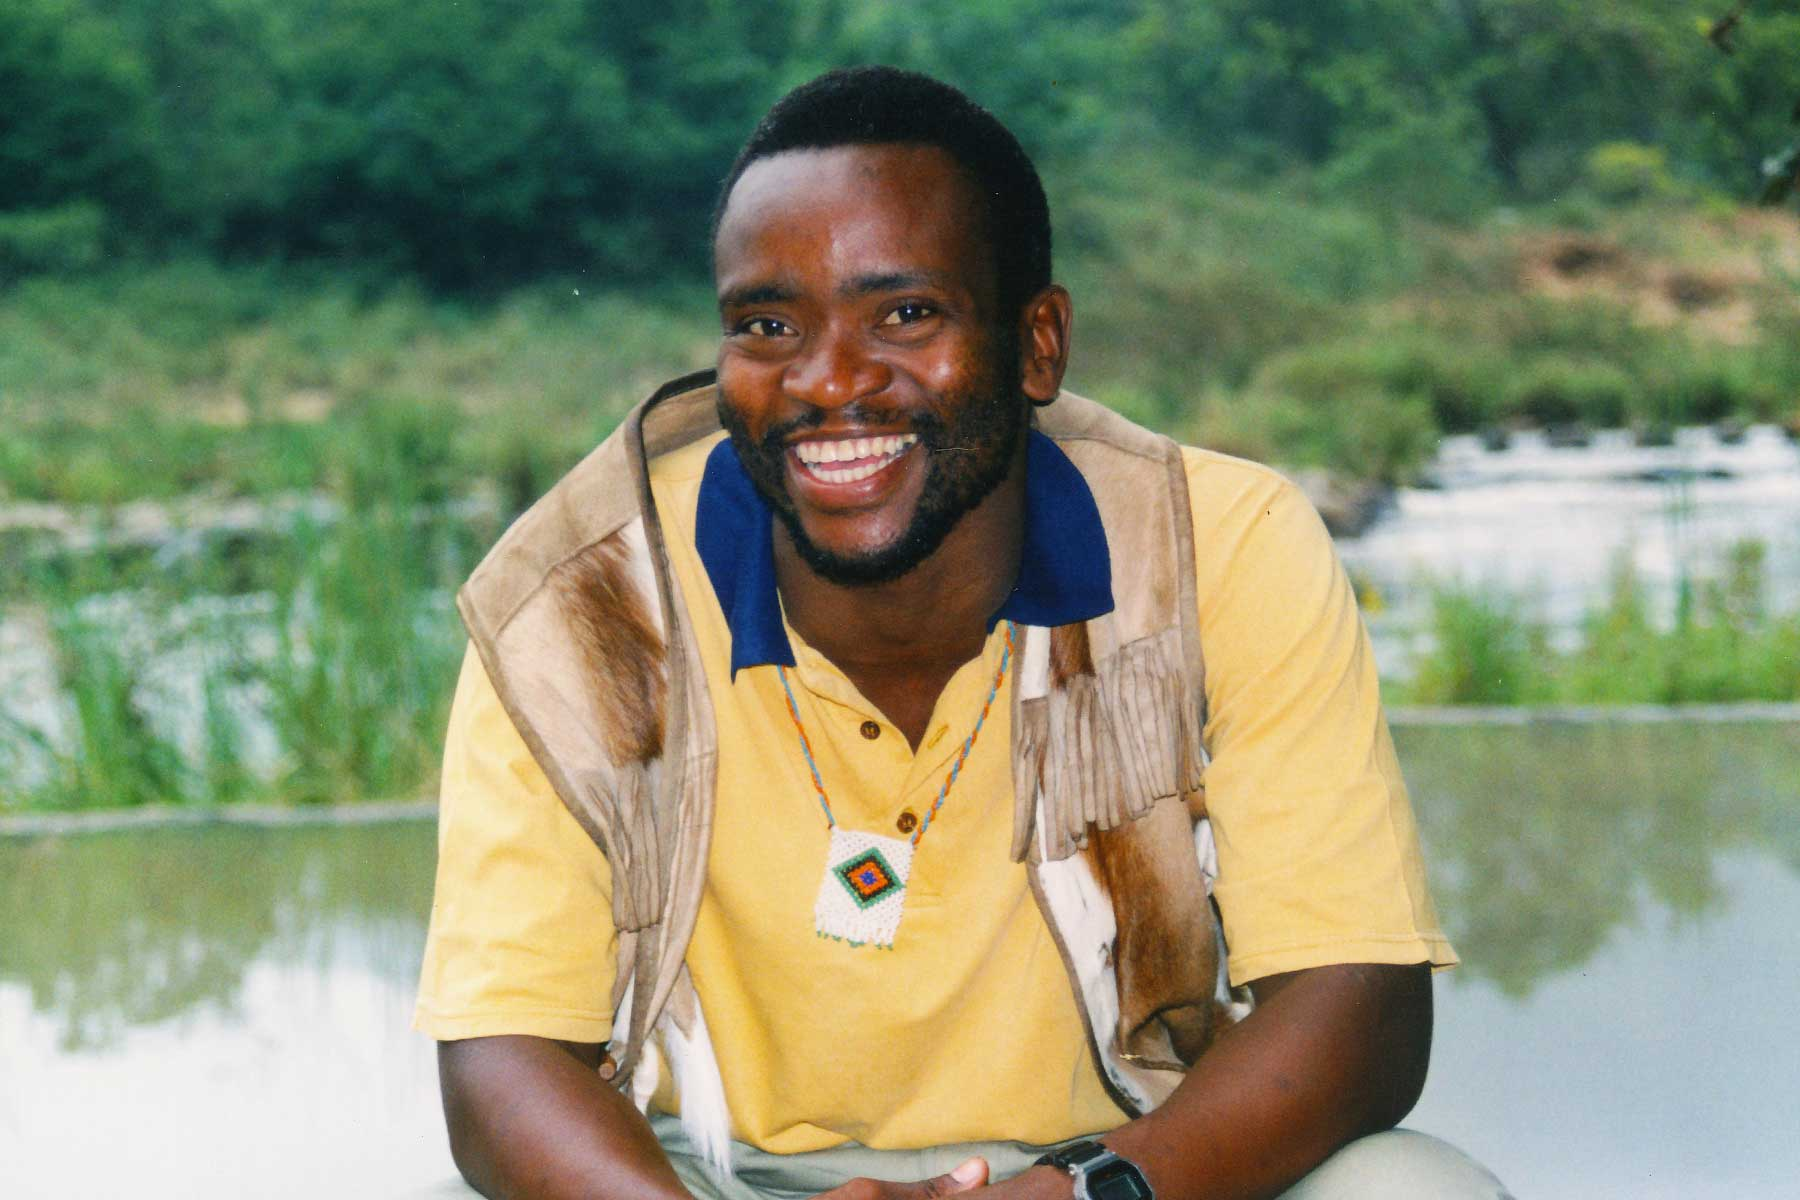 KwaZulu-Natal Guide | Steven Andrew Martin | South Africa Photo Journal | Steven A. Martin | Study Abroad Journal